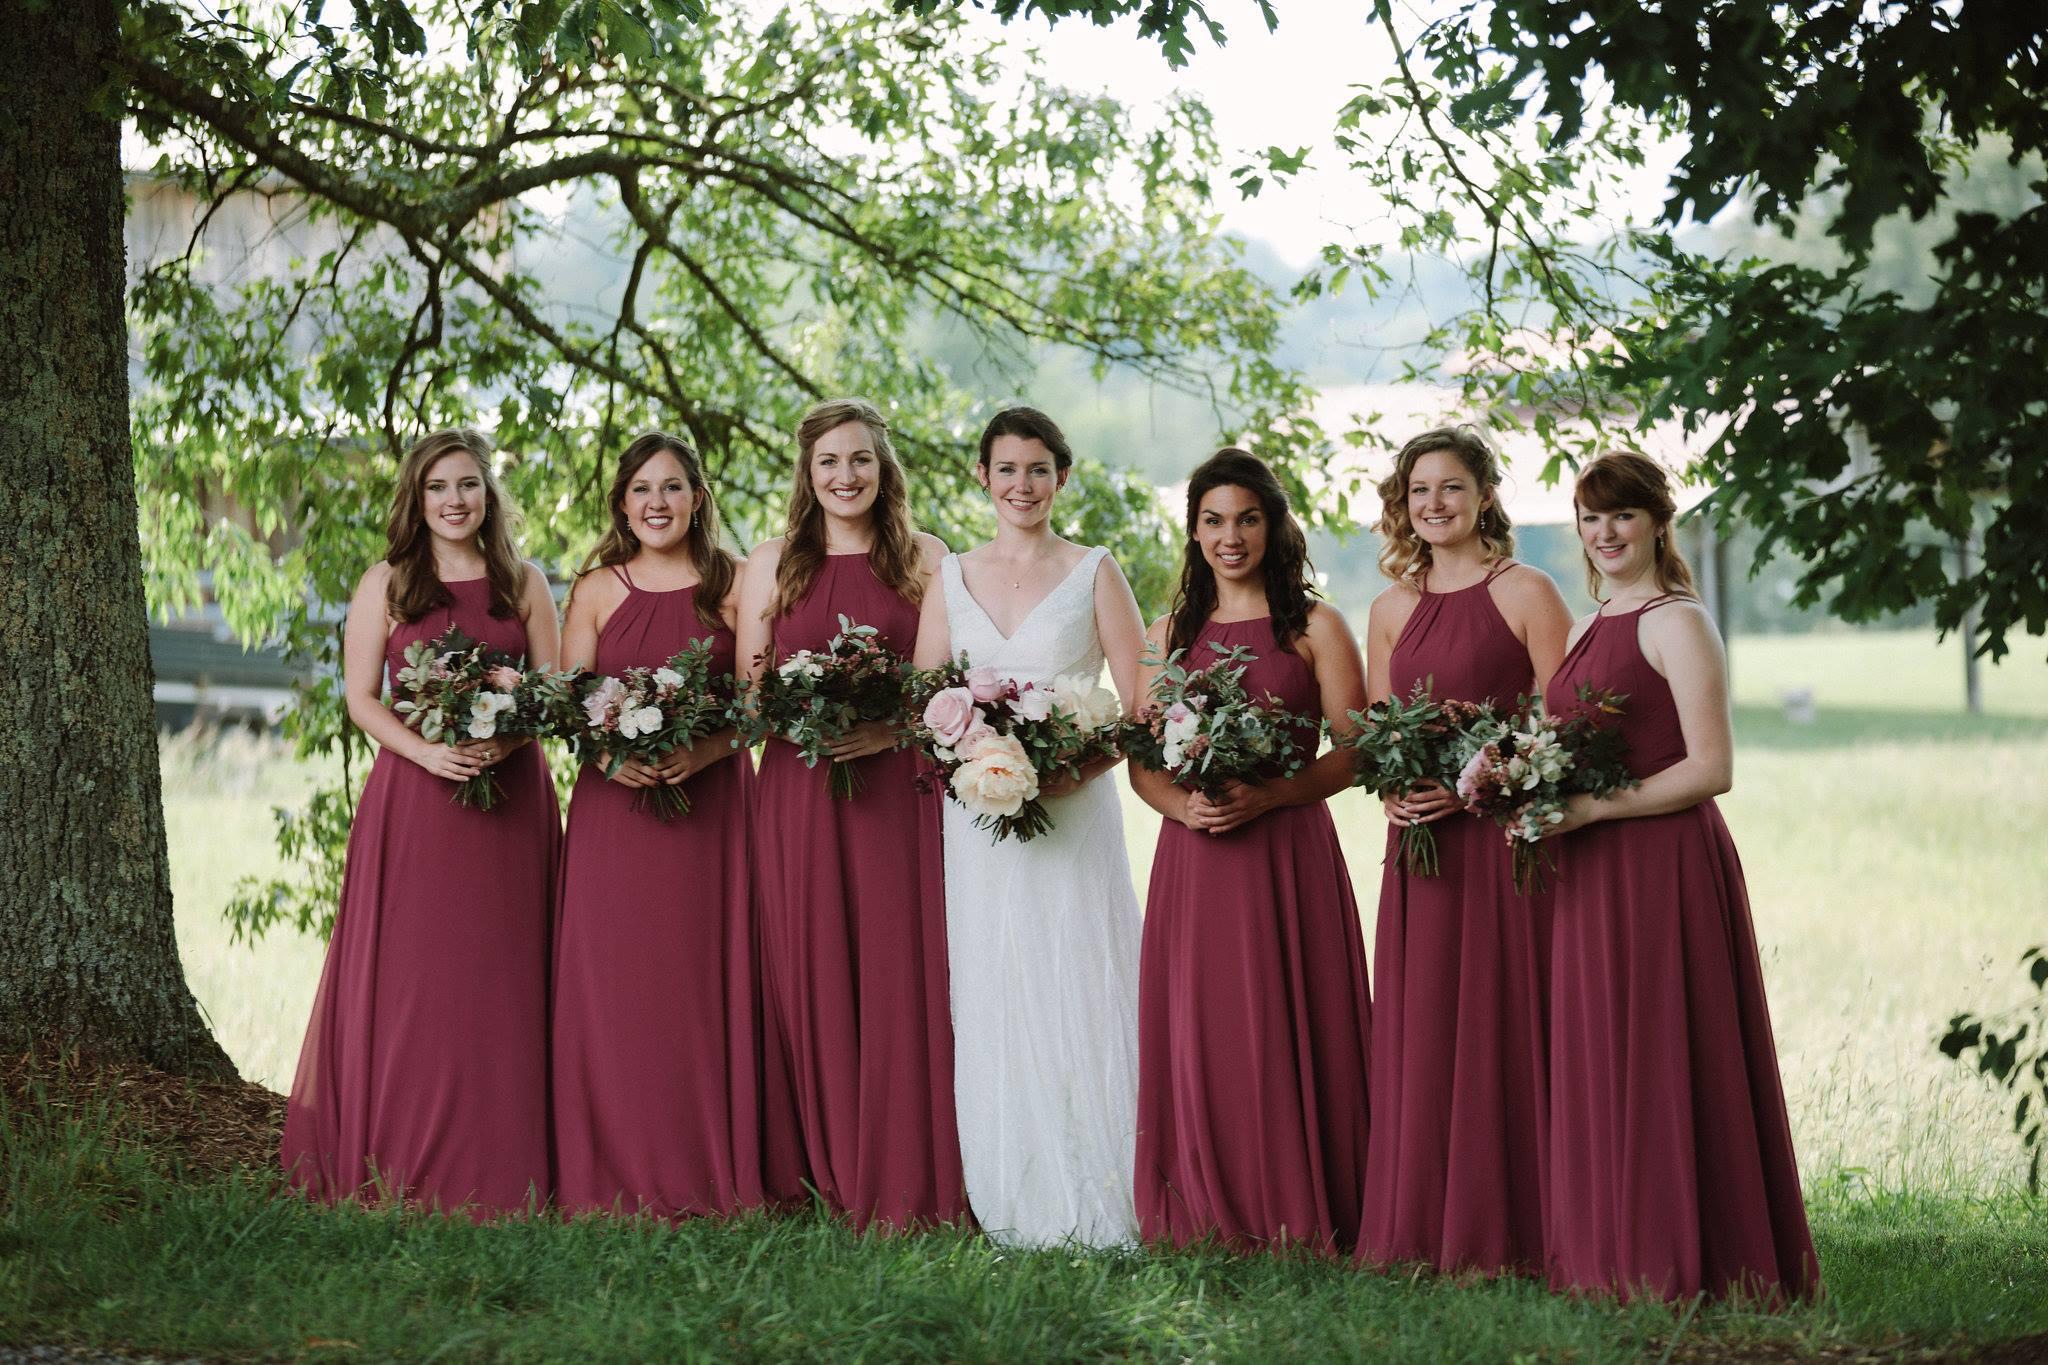 Cabernet Bridesmaid Dresses